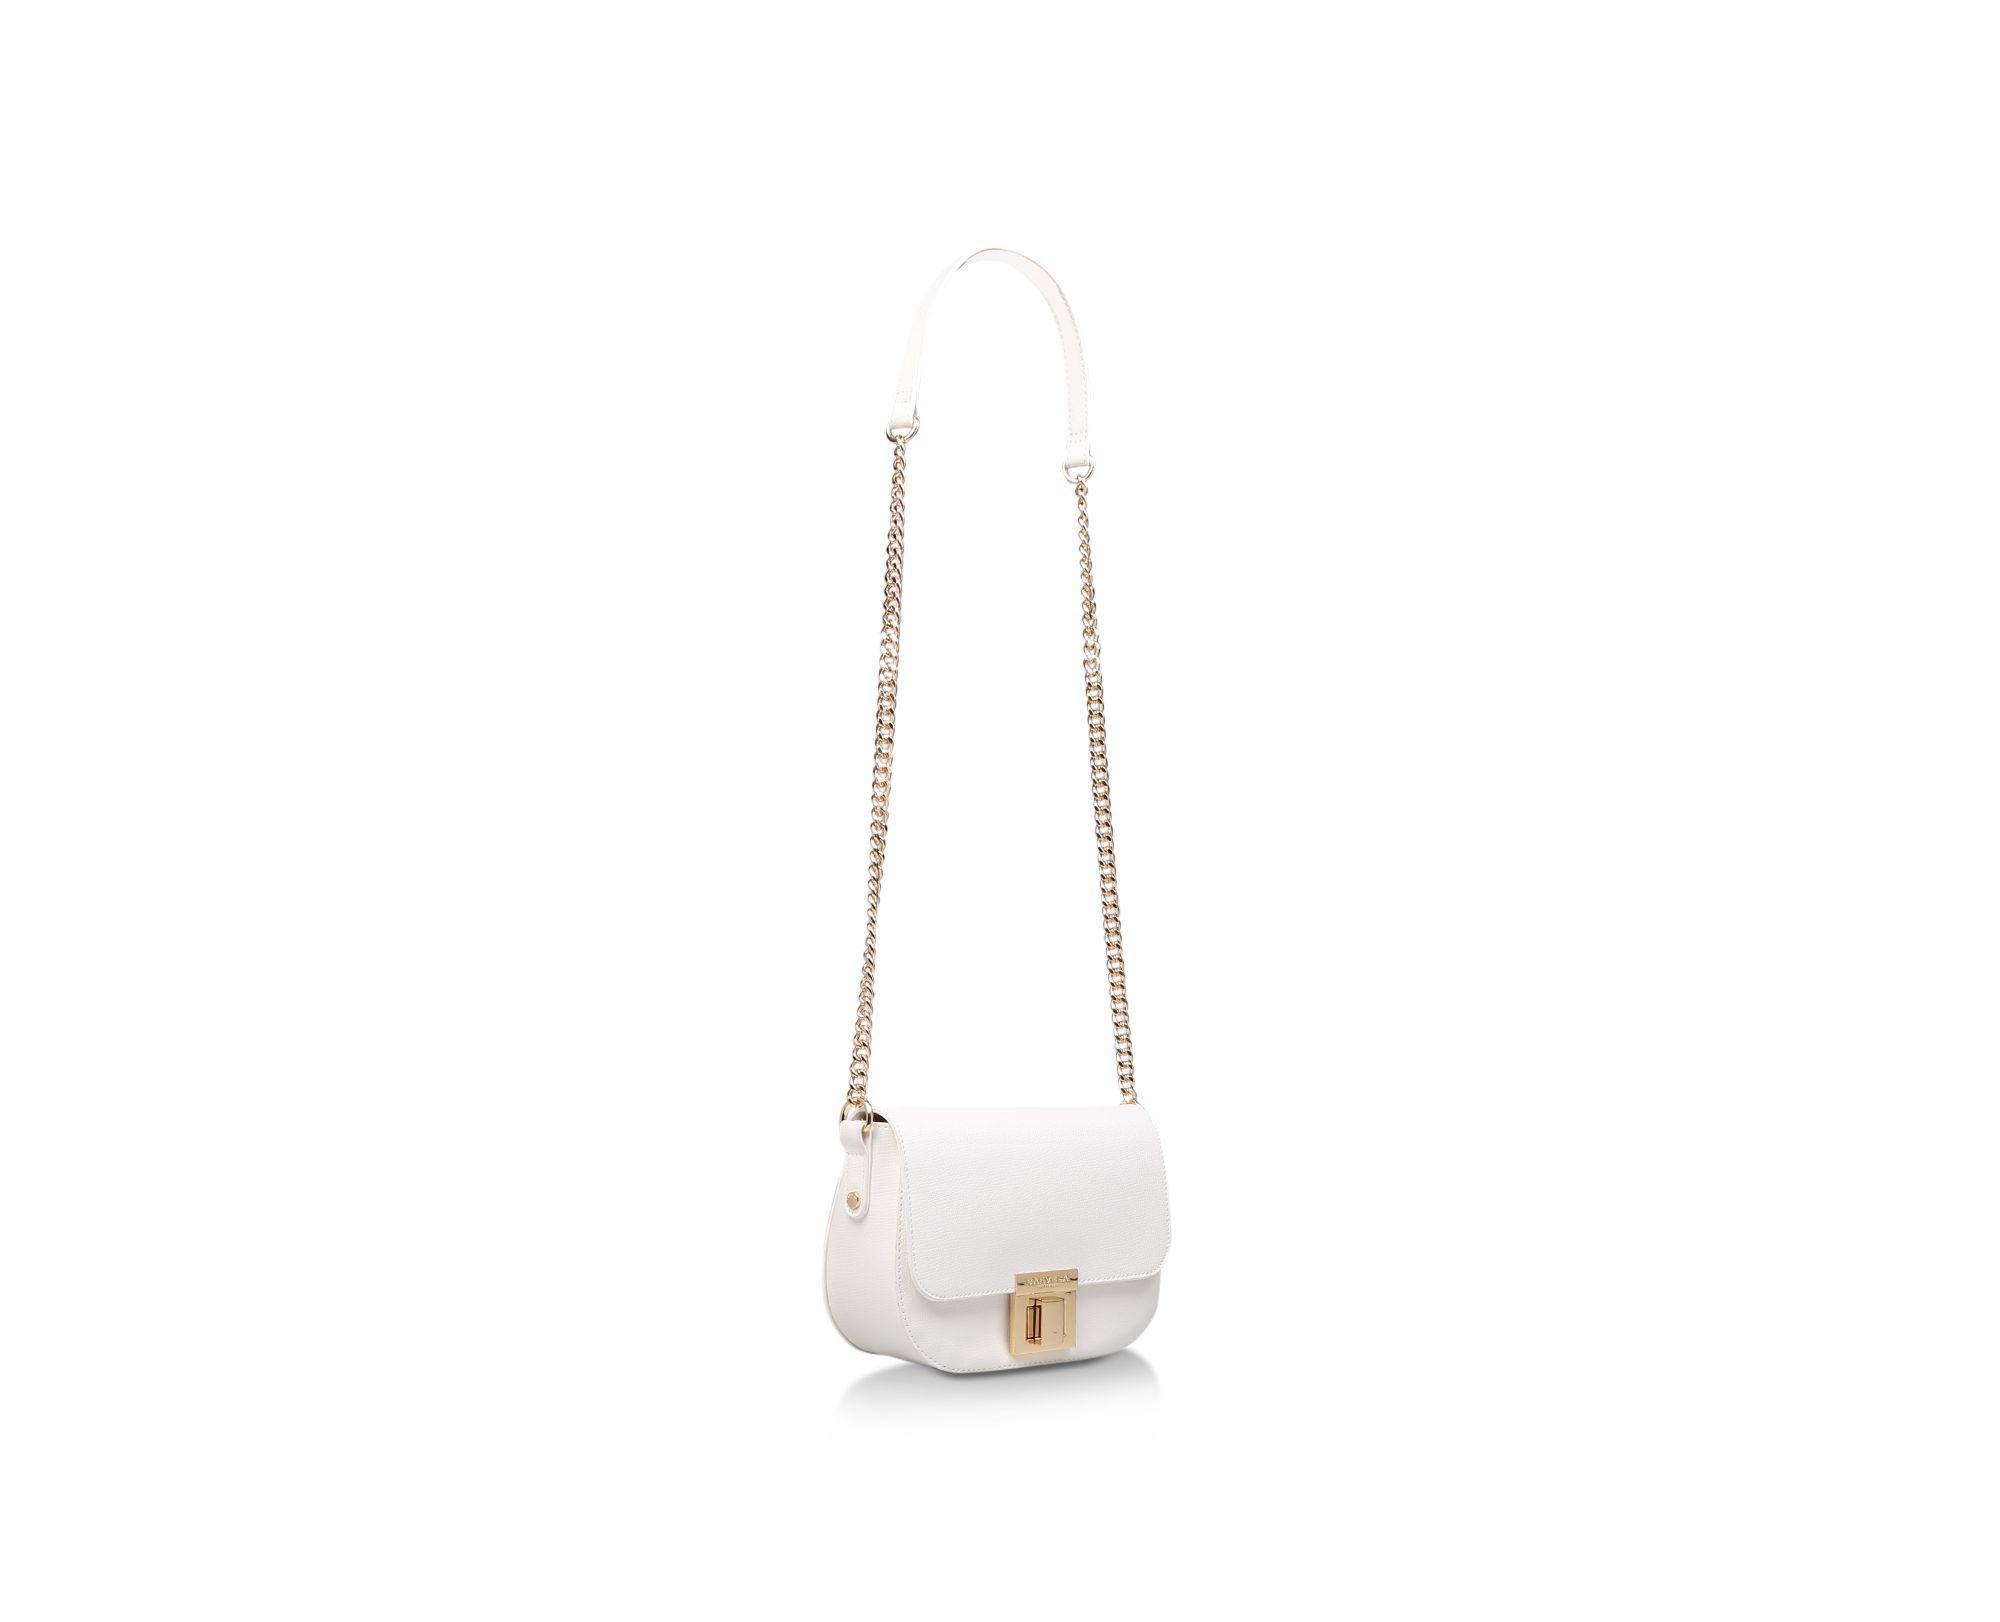 Carvela Kurt Geiger - White  sara Clean Saddle Bag  Cross Body Bag - Lyst.  View fullscreen 823275bcce82a